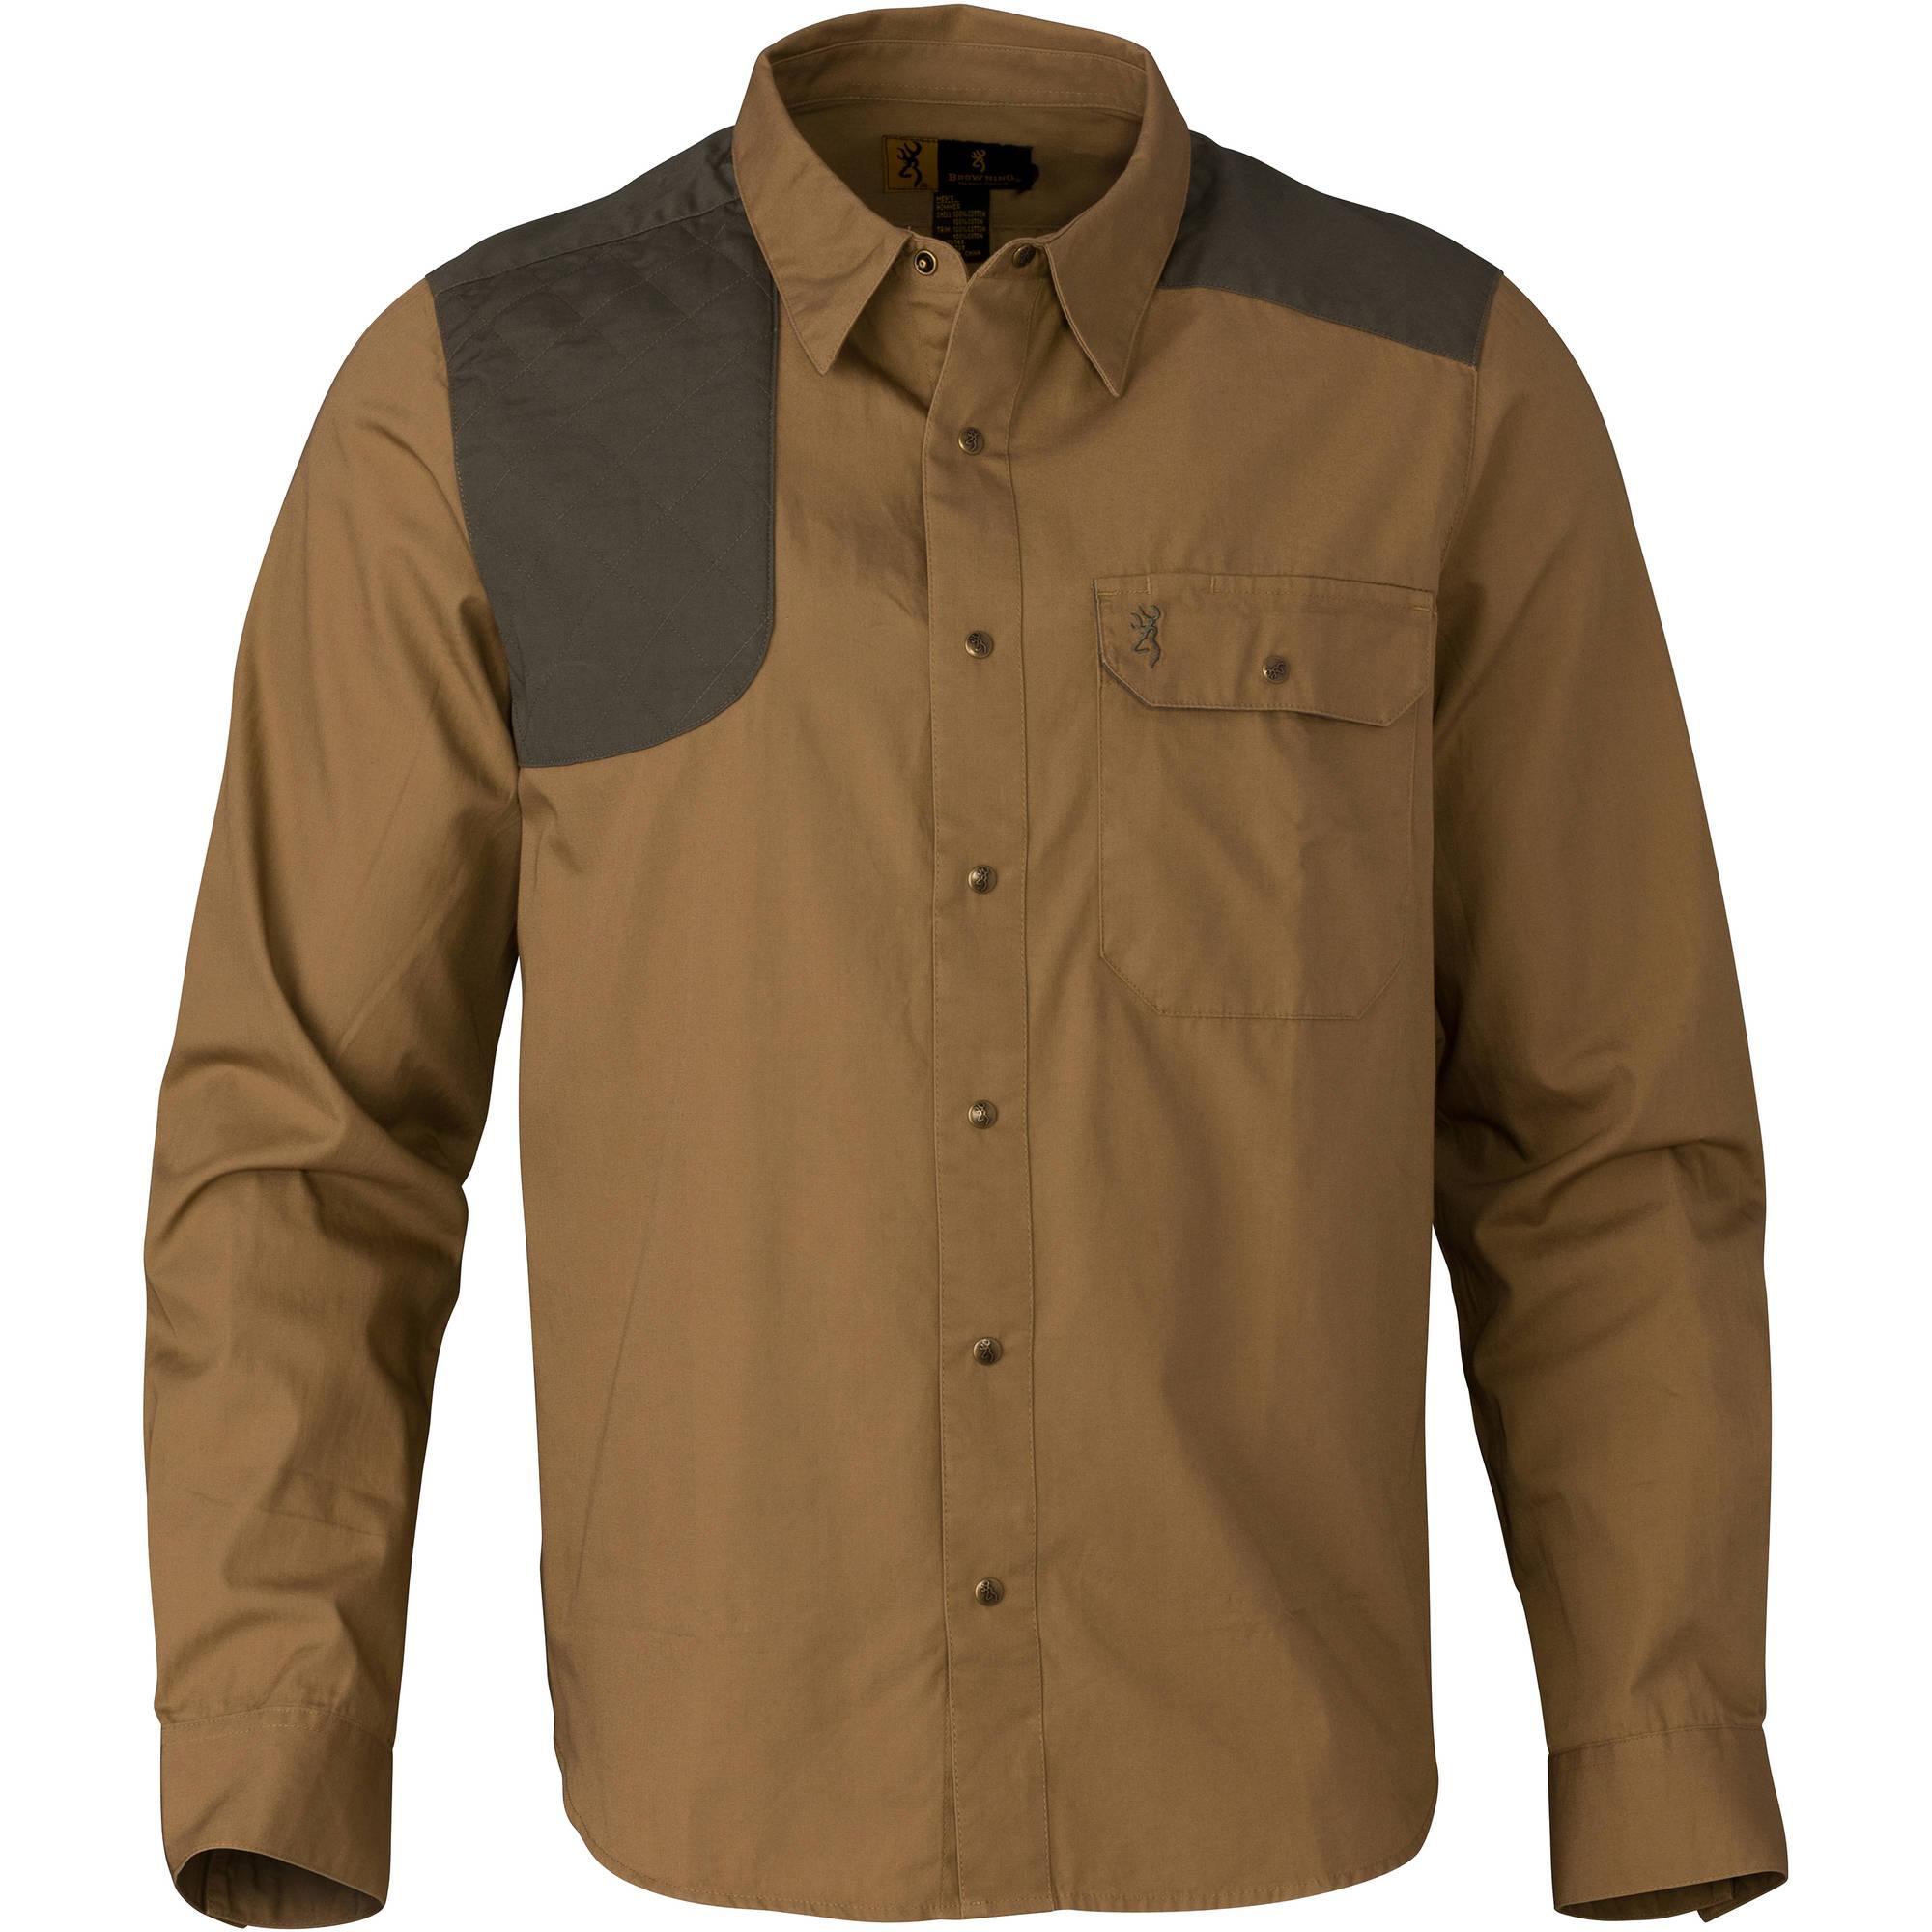 Browning Austin Shooting Shirt, Long Sleeve Taupe/Loden